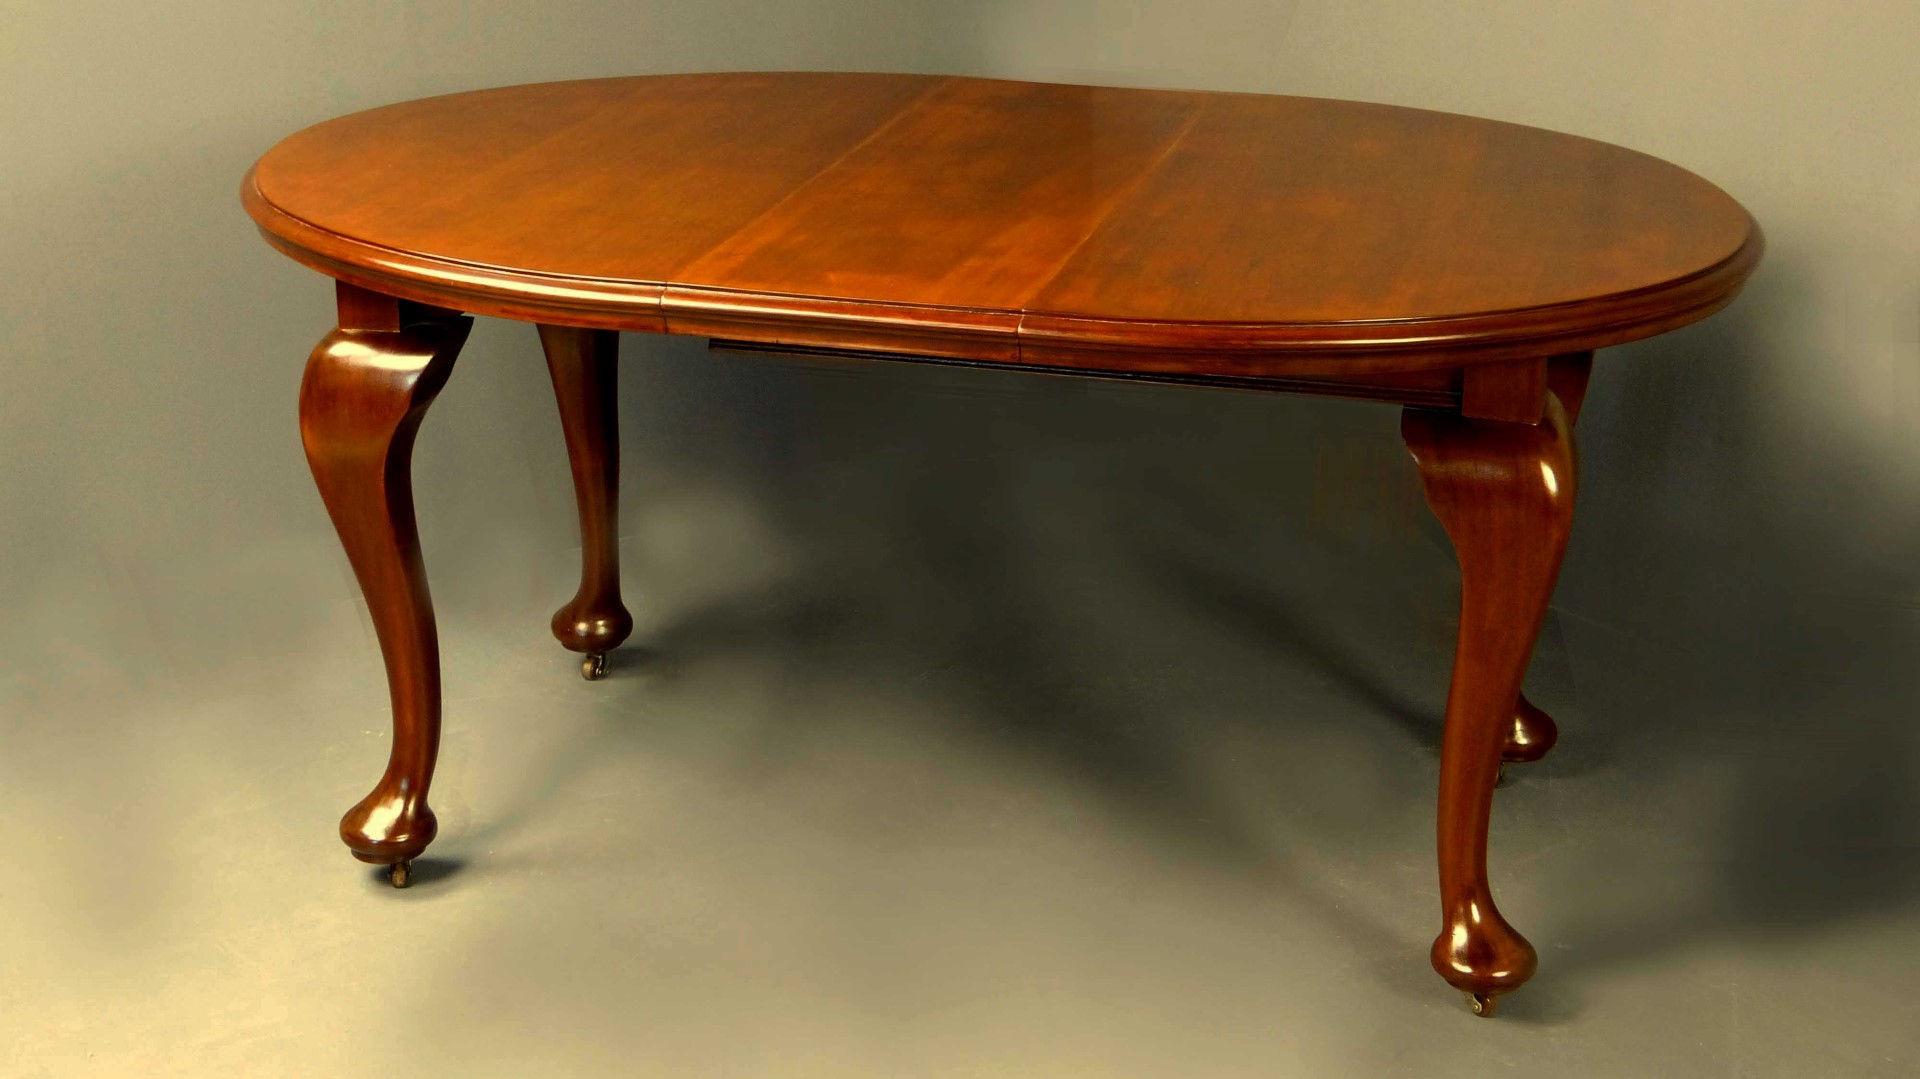 Muebles antiguos armarios antiguos mesas antiguas - Mesas redondas de comedor antiguas ...